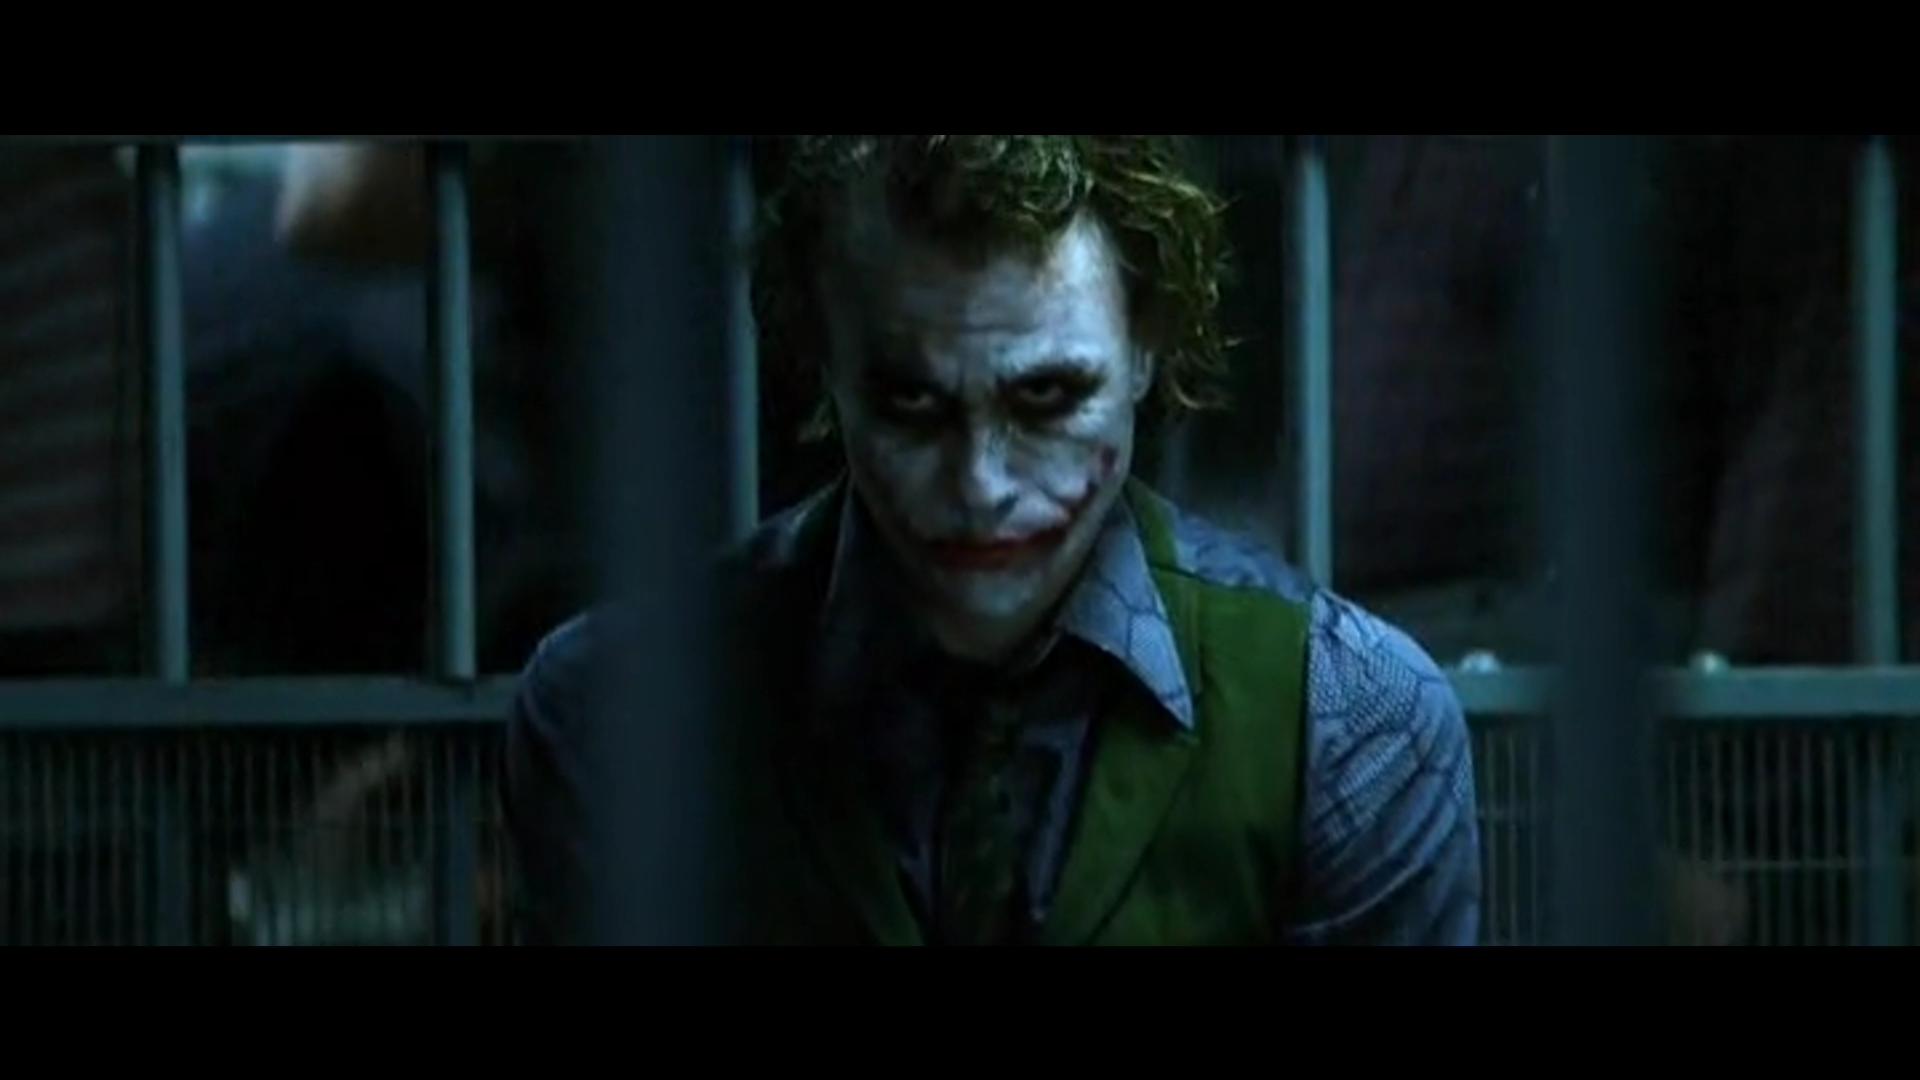 Joker Quotes Wallpaper Hd The Joker Quotes Heath Ledger Quotesgram